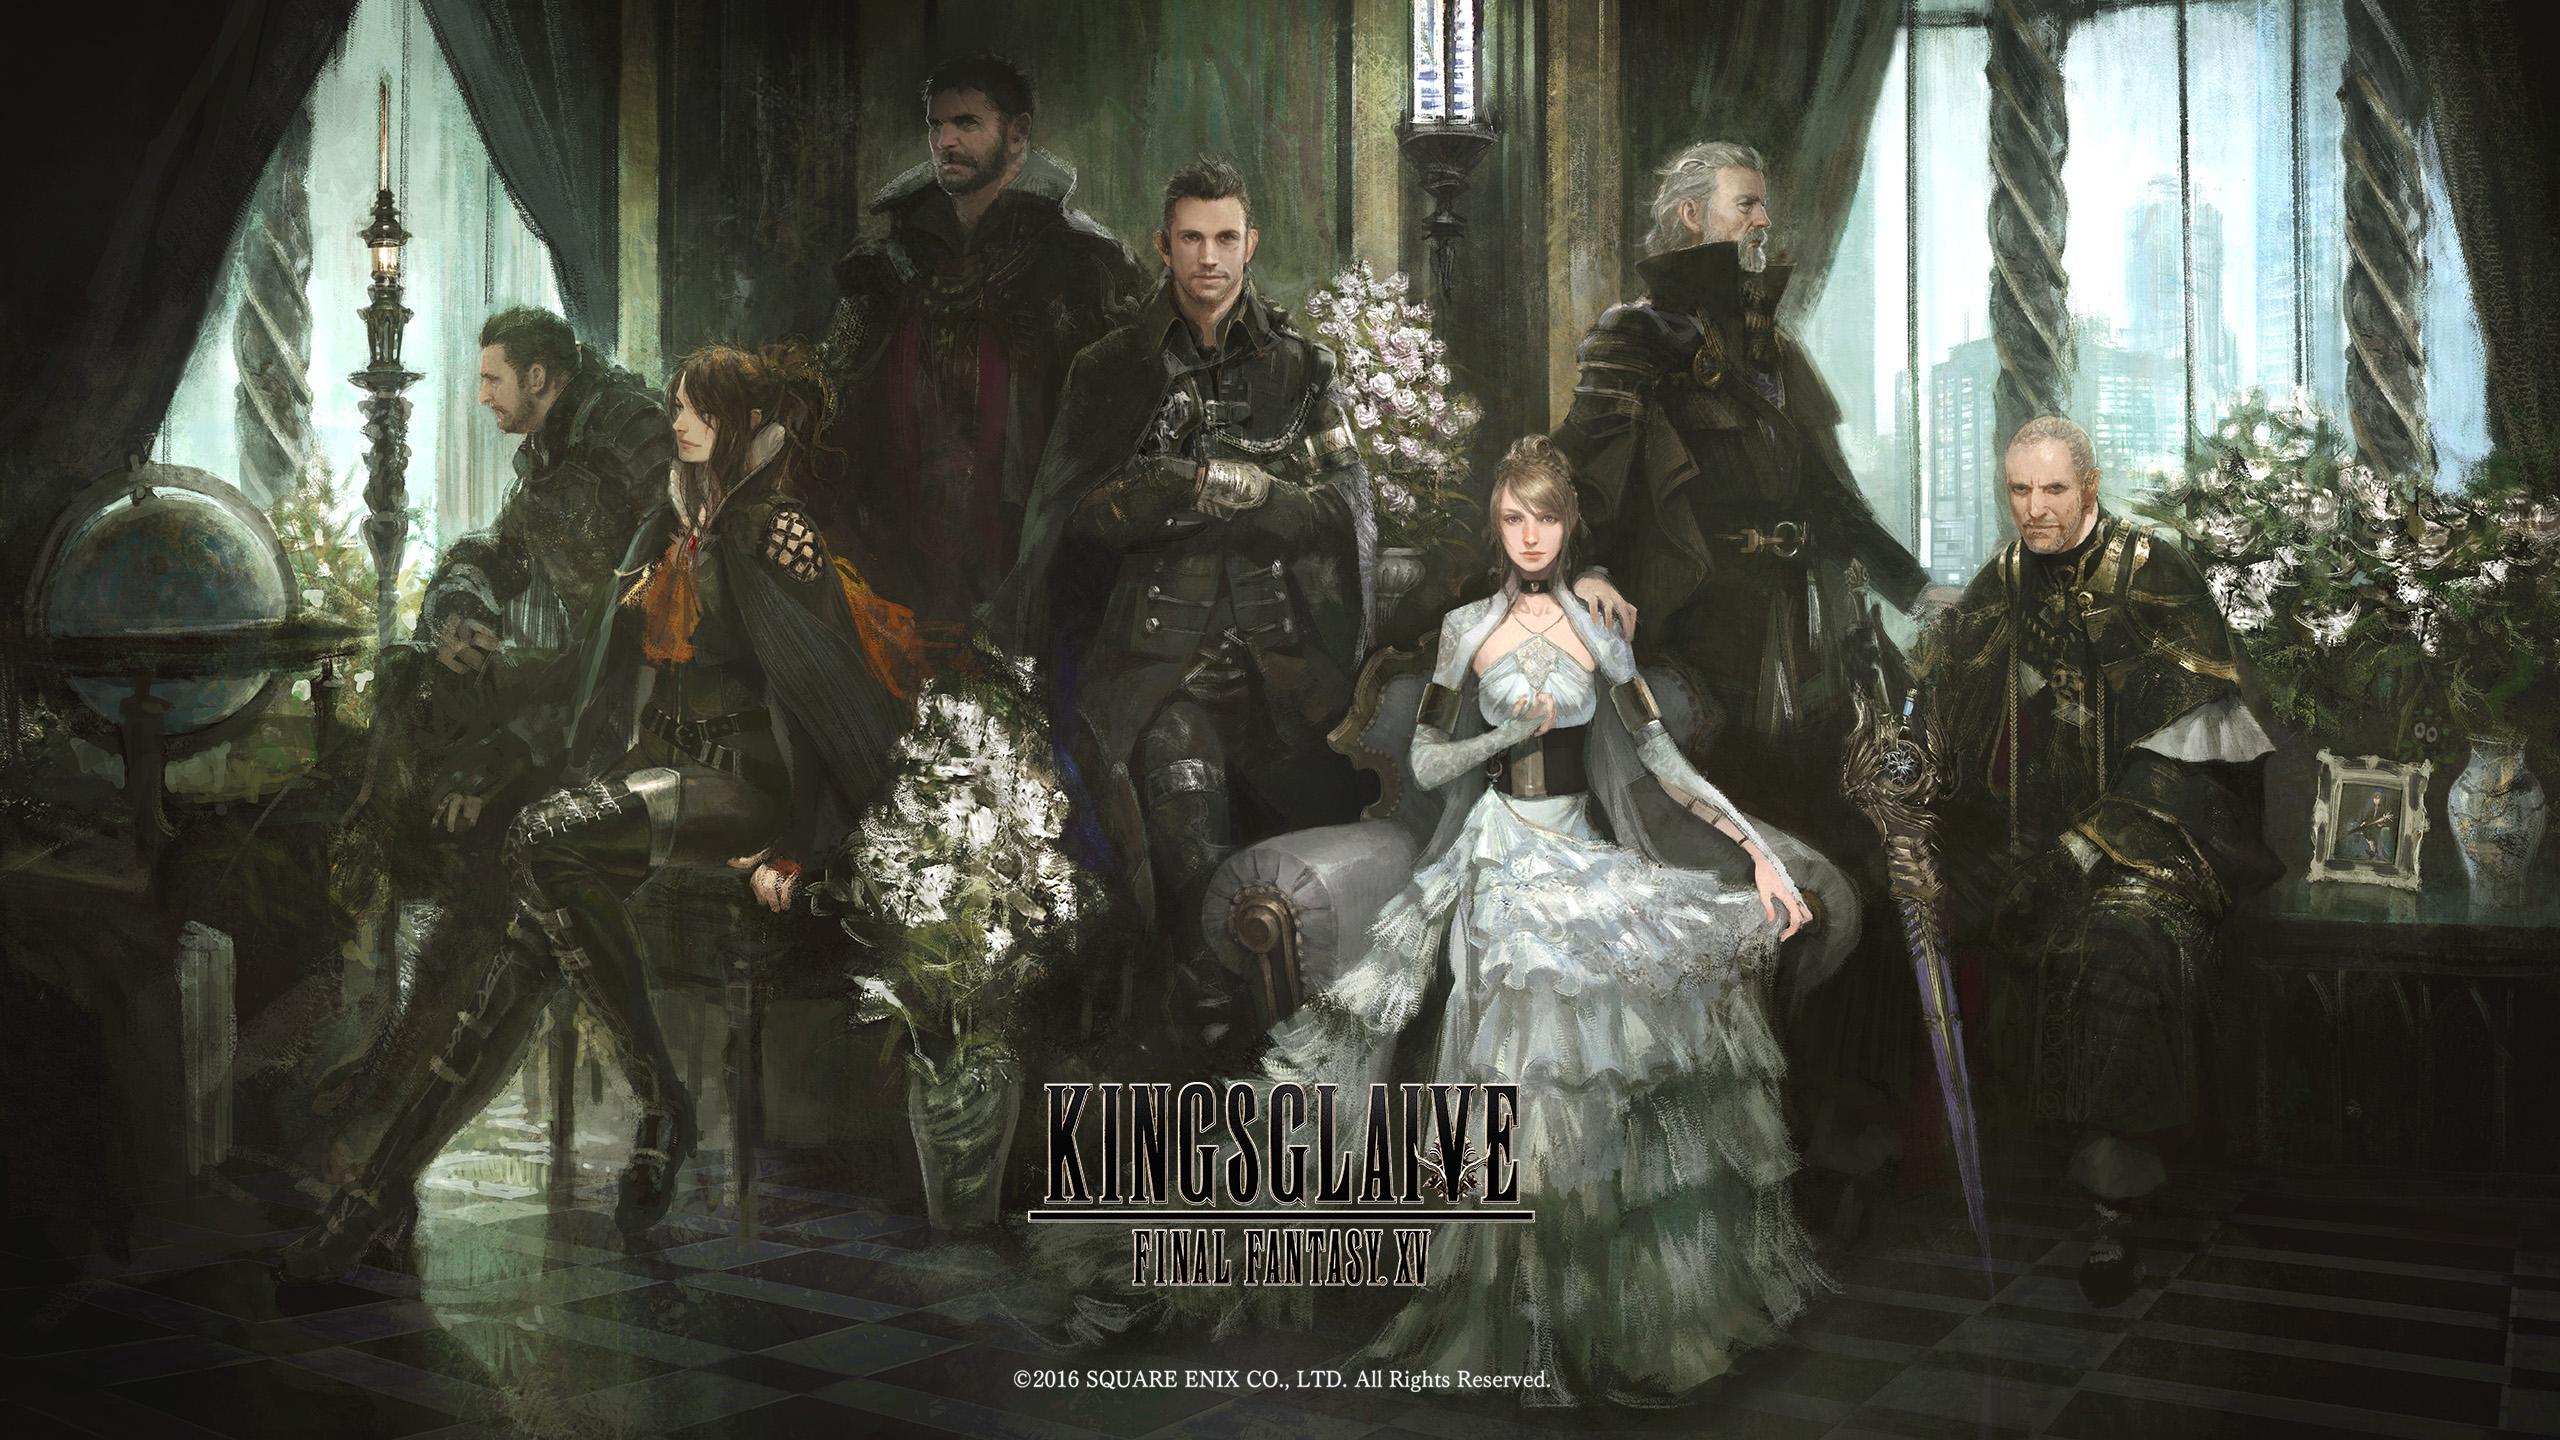 Final-Fantasy-Игры-Lunafreya-Nox-Fleuret-nyx-ulric-3943360.jpeg - Final Fantasy 15